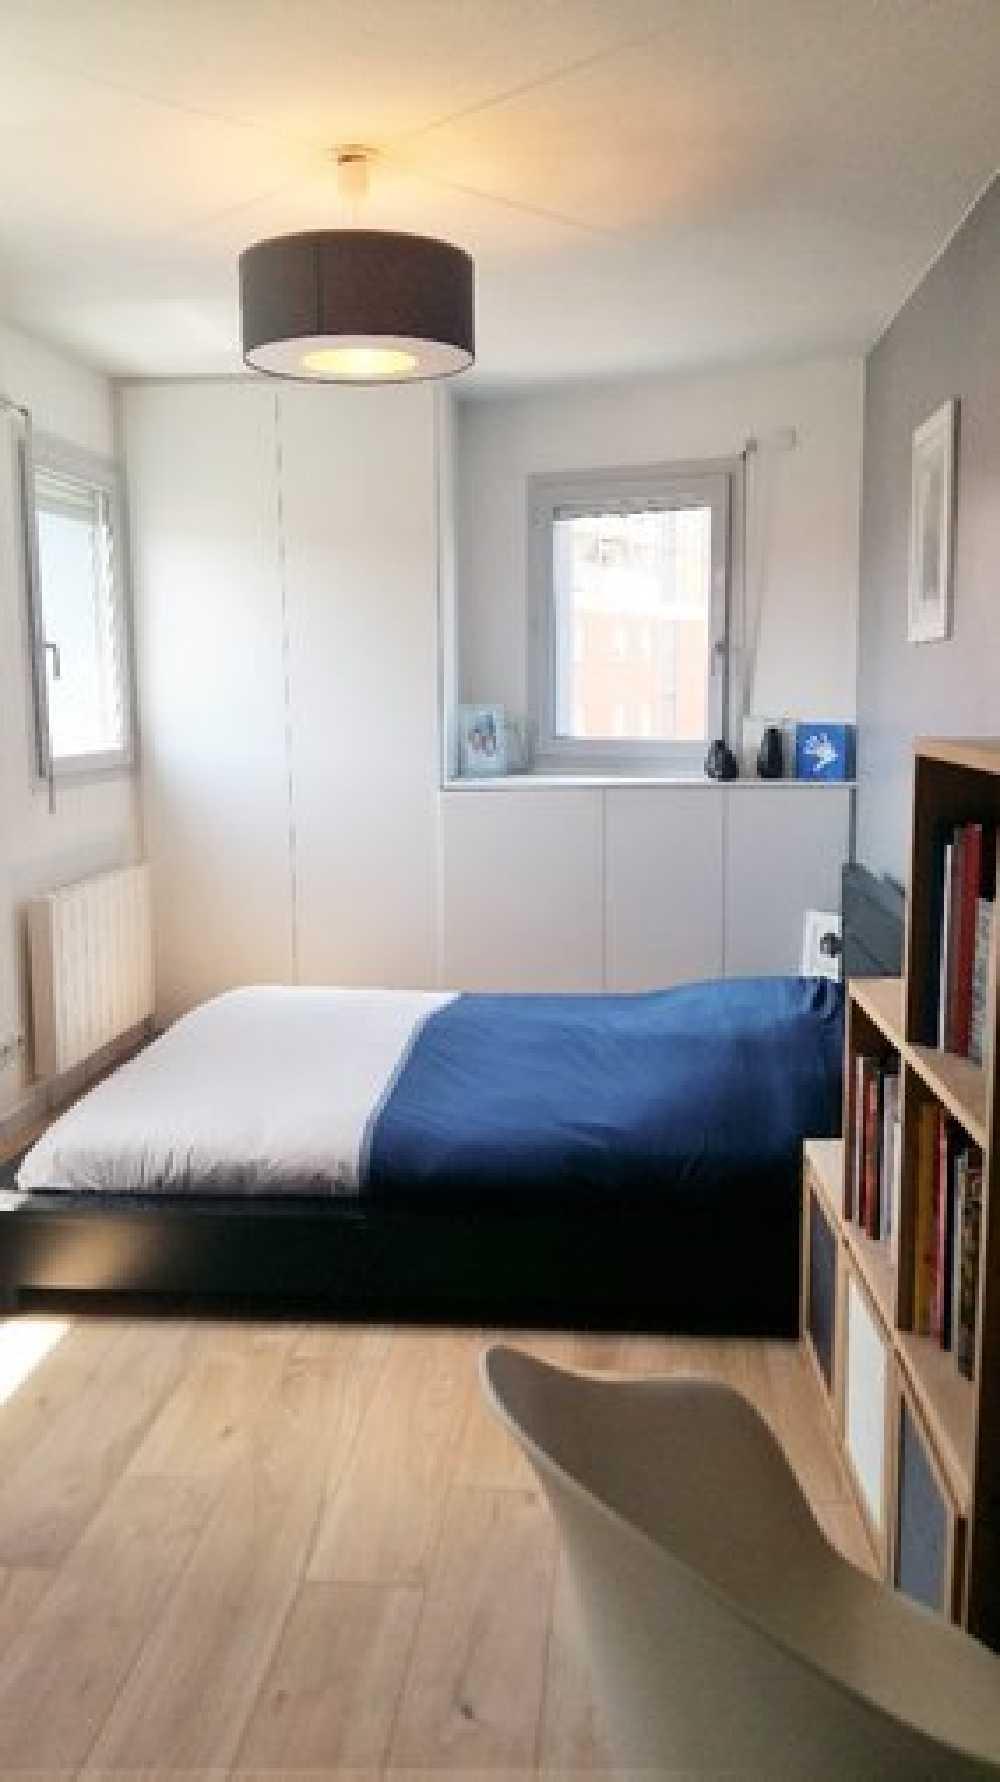 Toulouse Haute-Garonne Apartment Bild 4089185